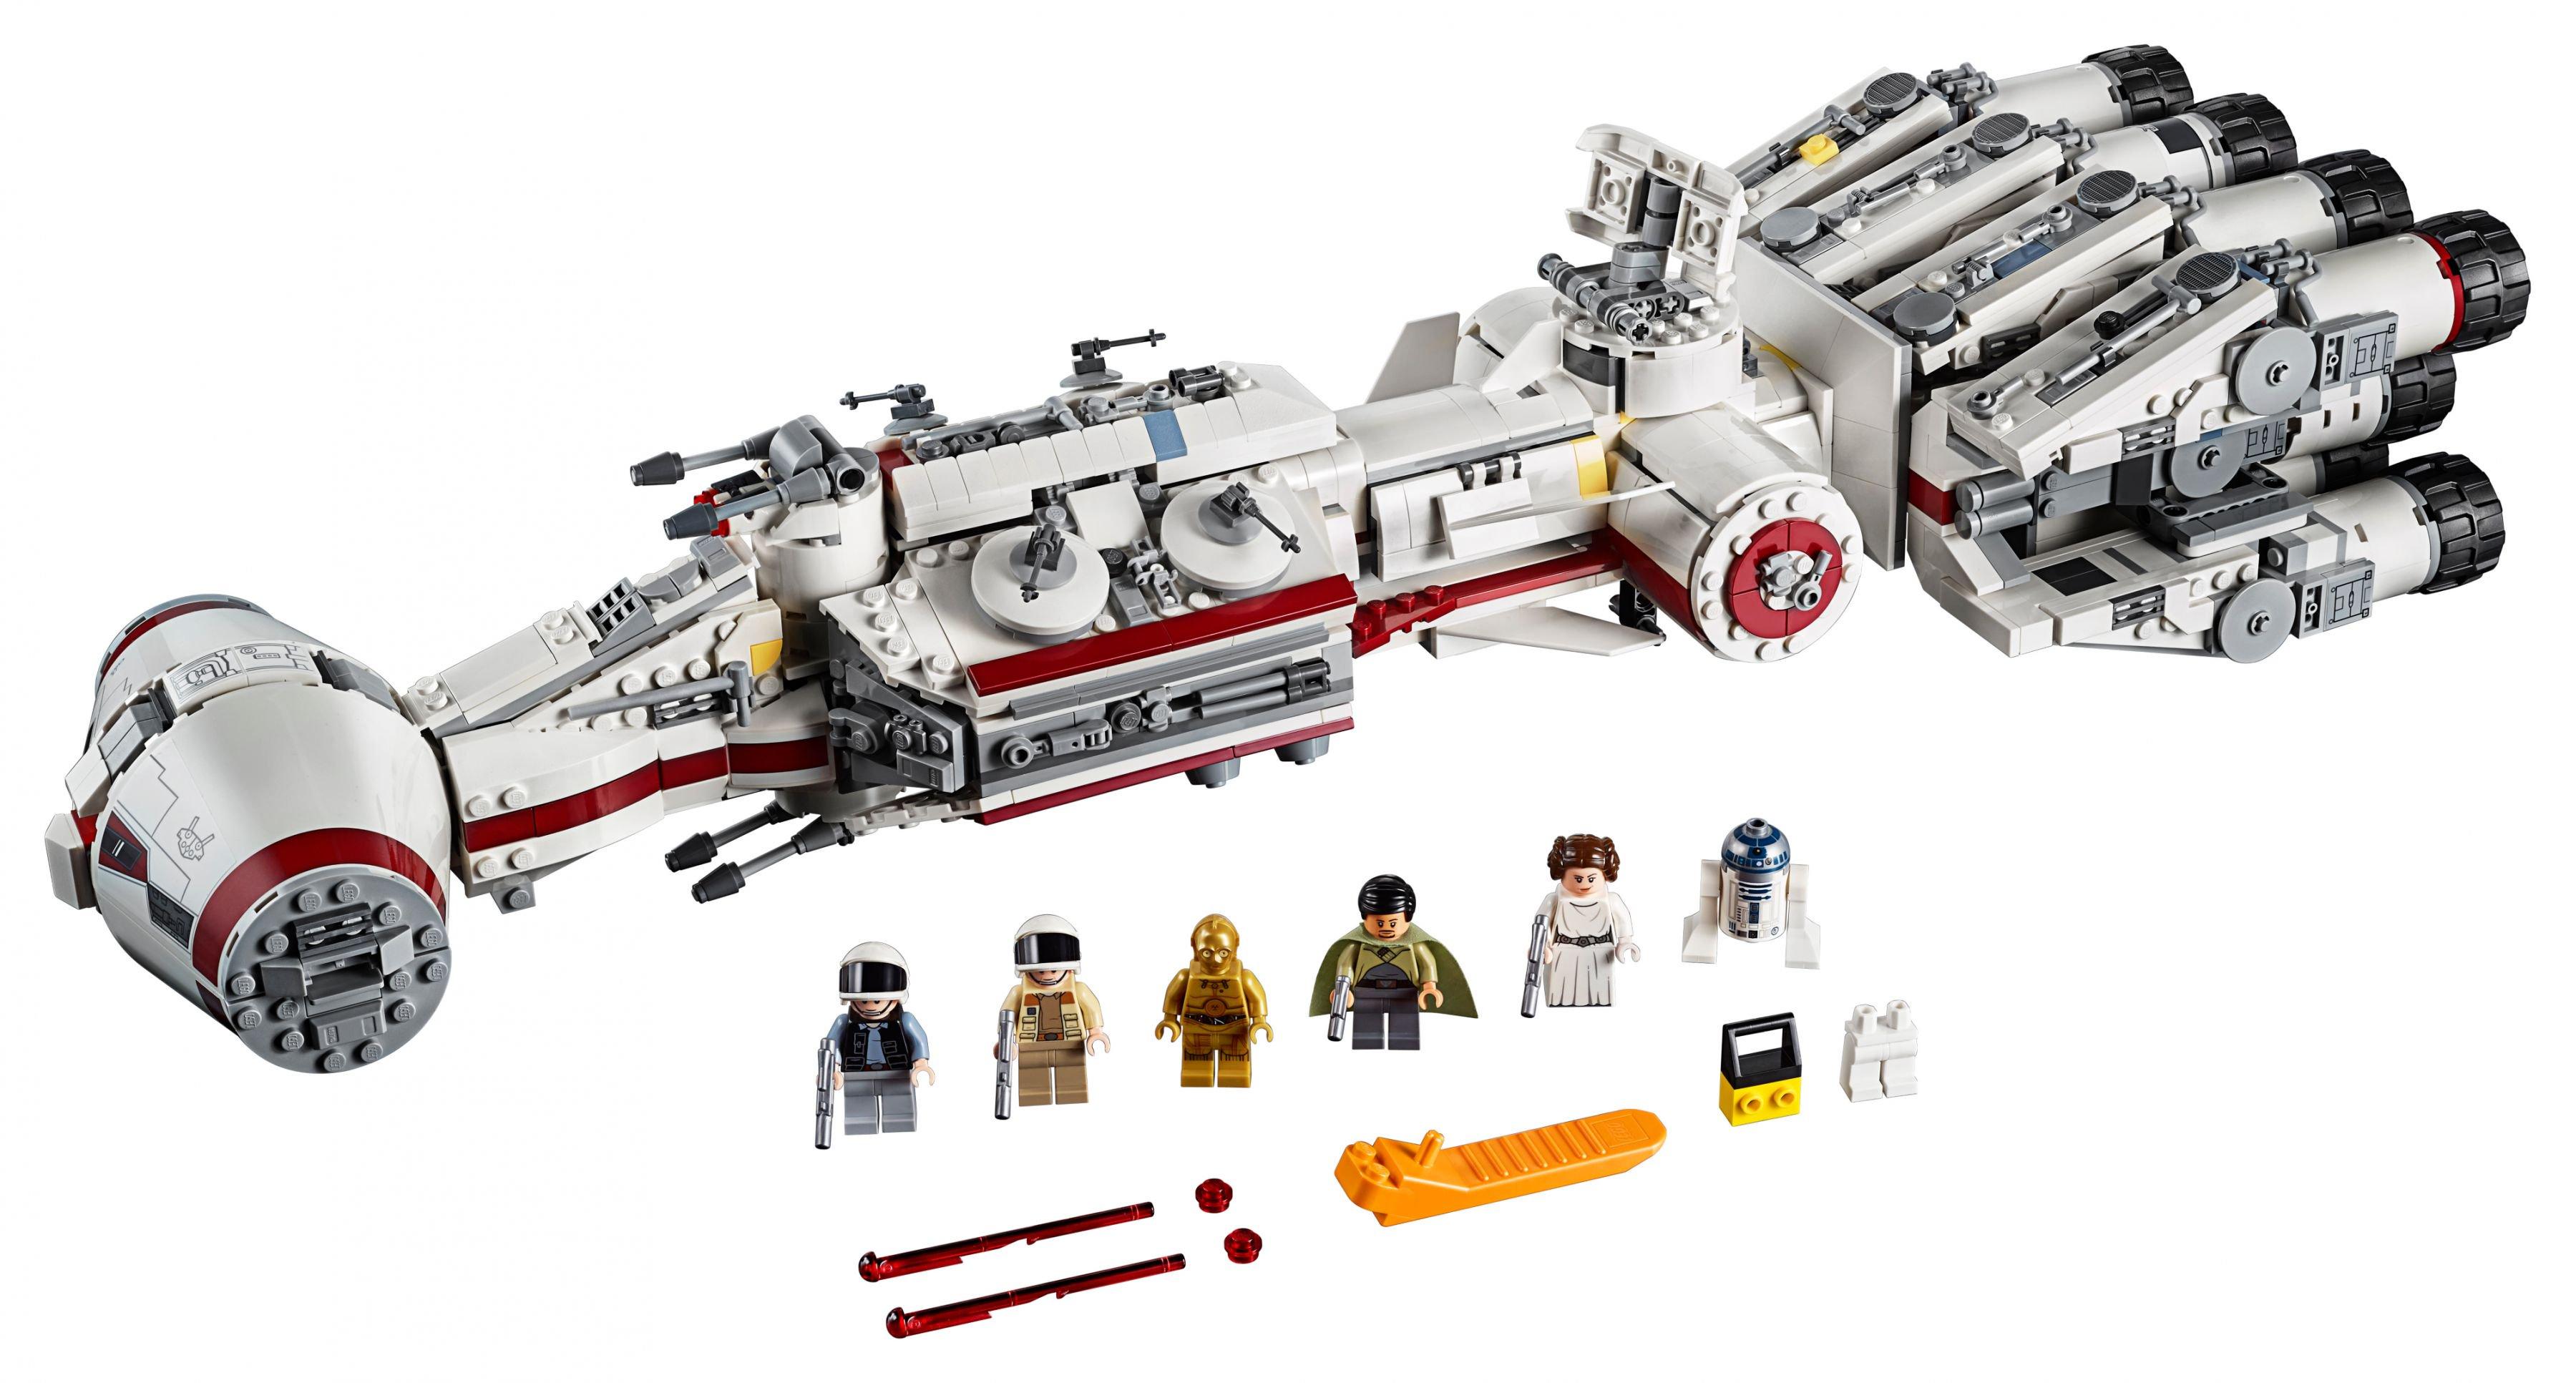 LEGO® Star Wars 75244 Tantive IV Brick Shop.nl 169,99 Euro